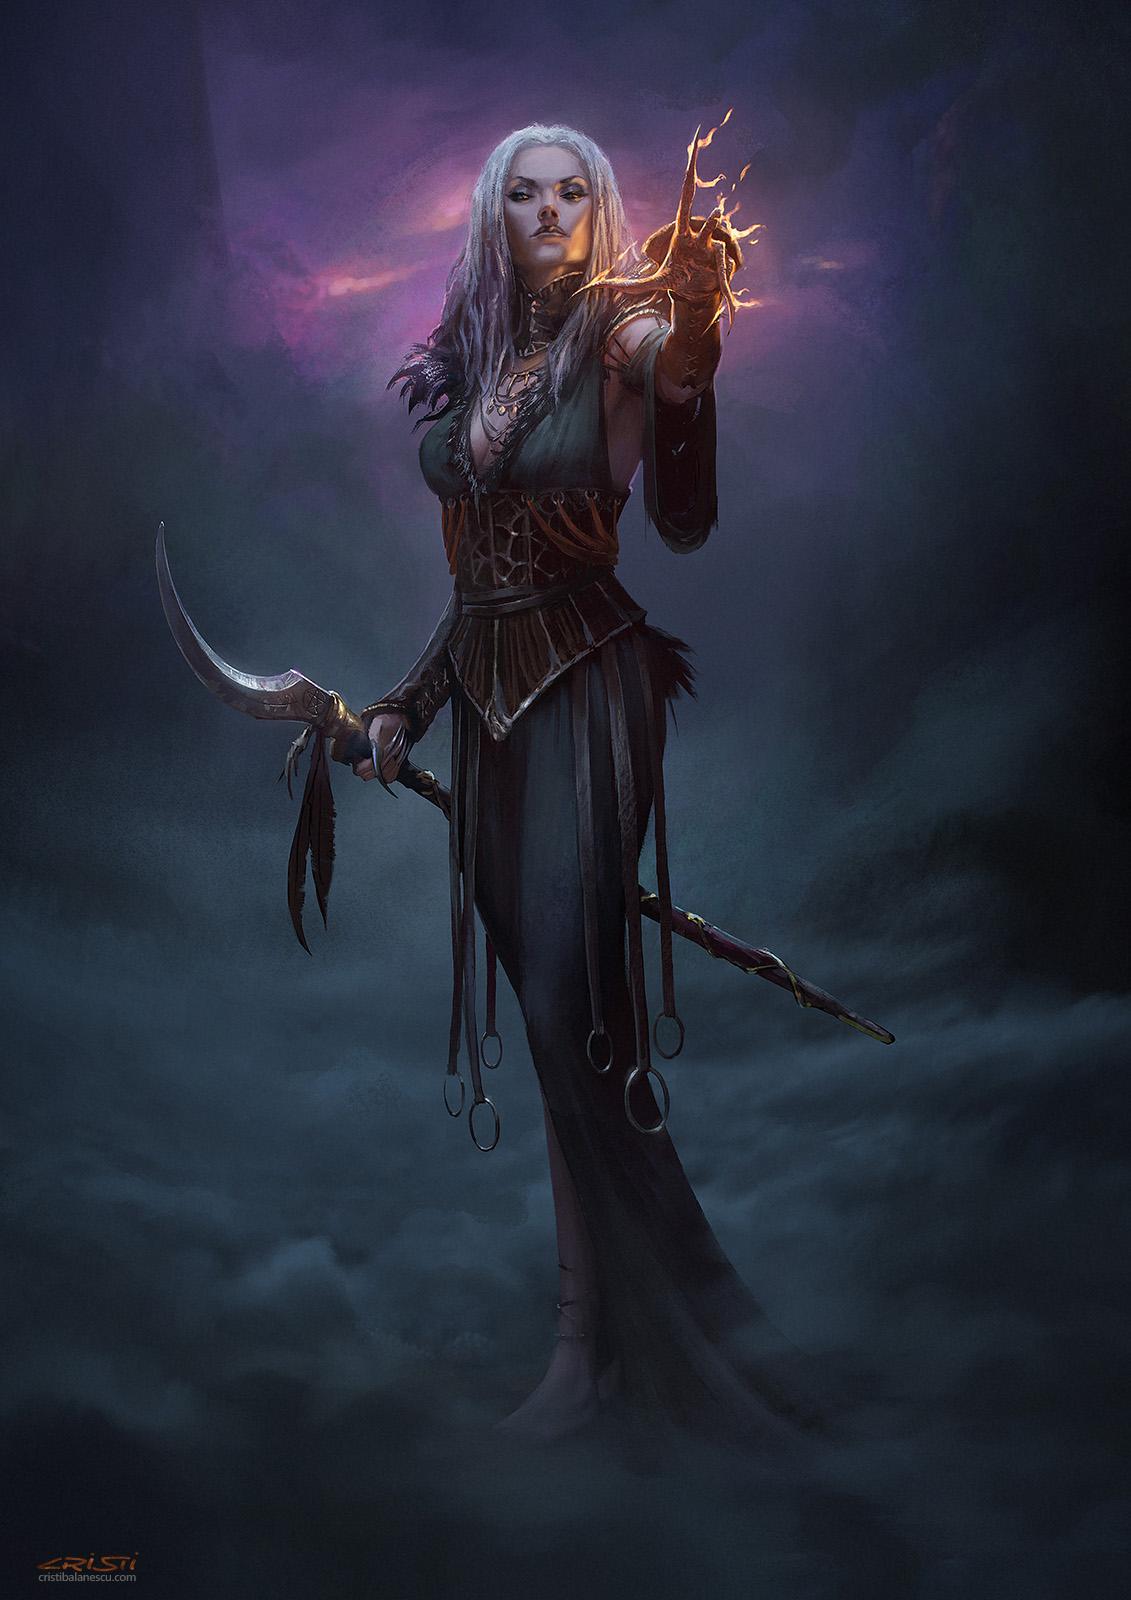 CristiB_Witch_web.jpg